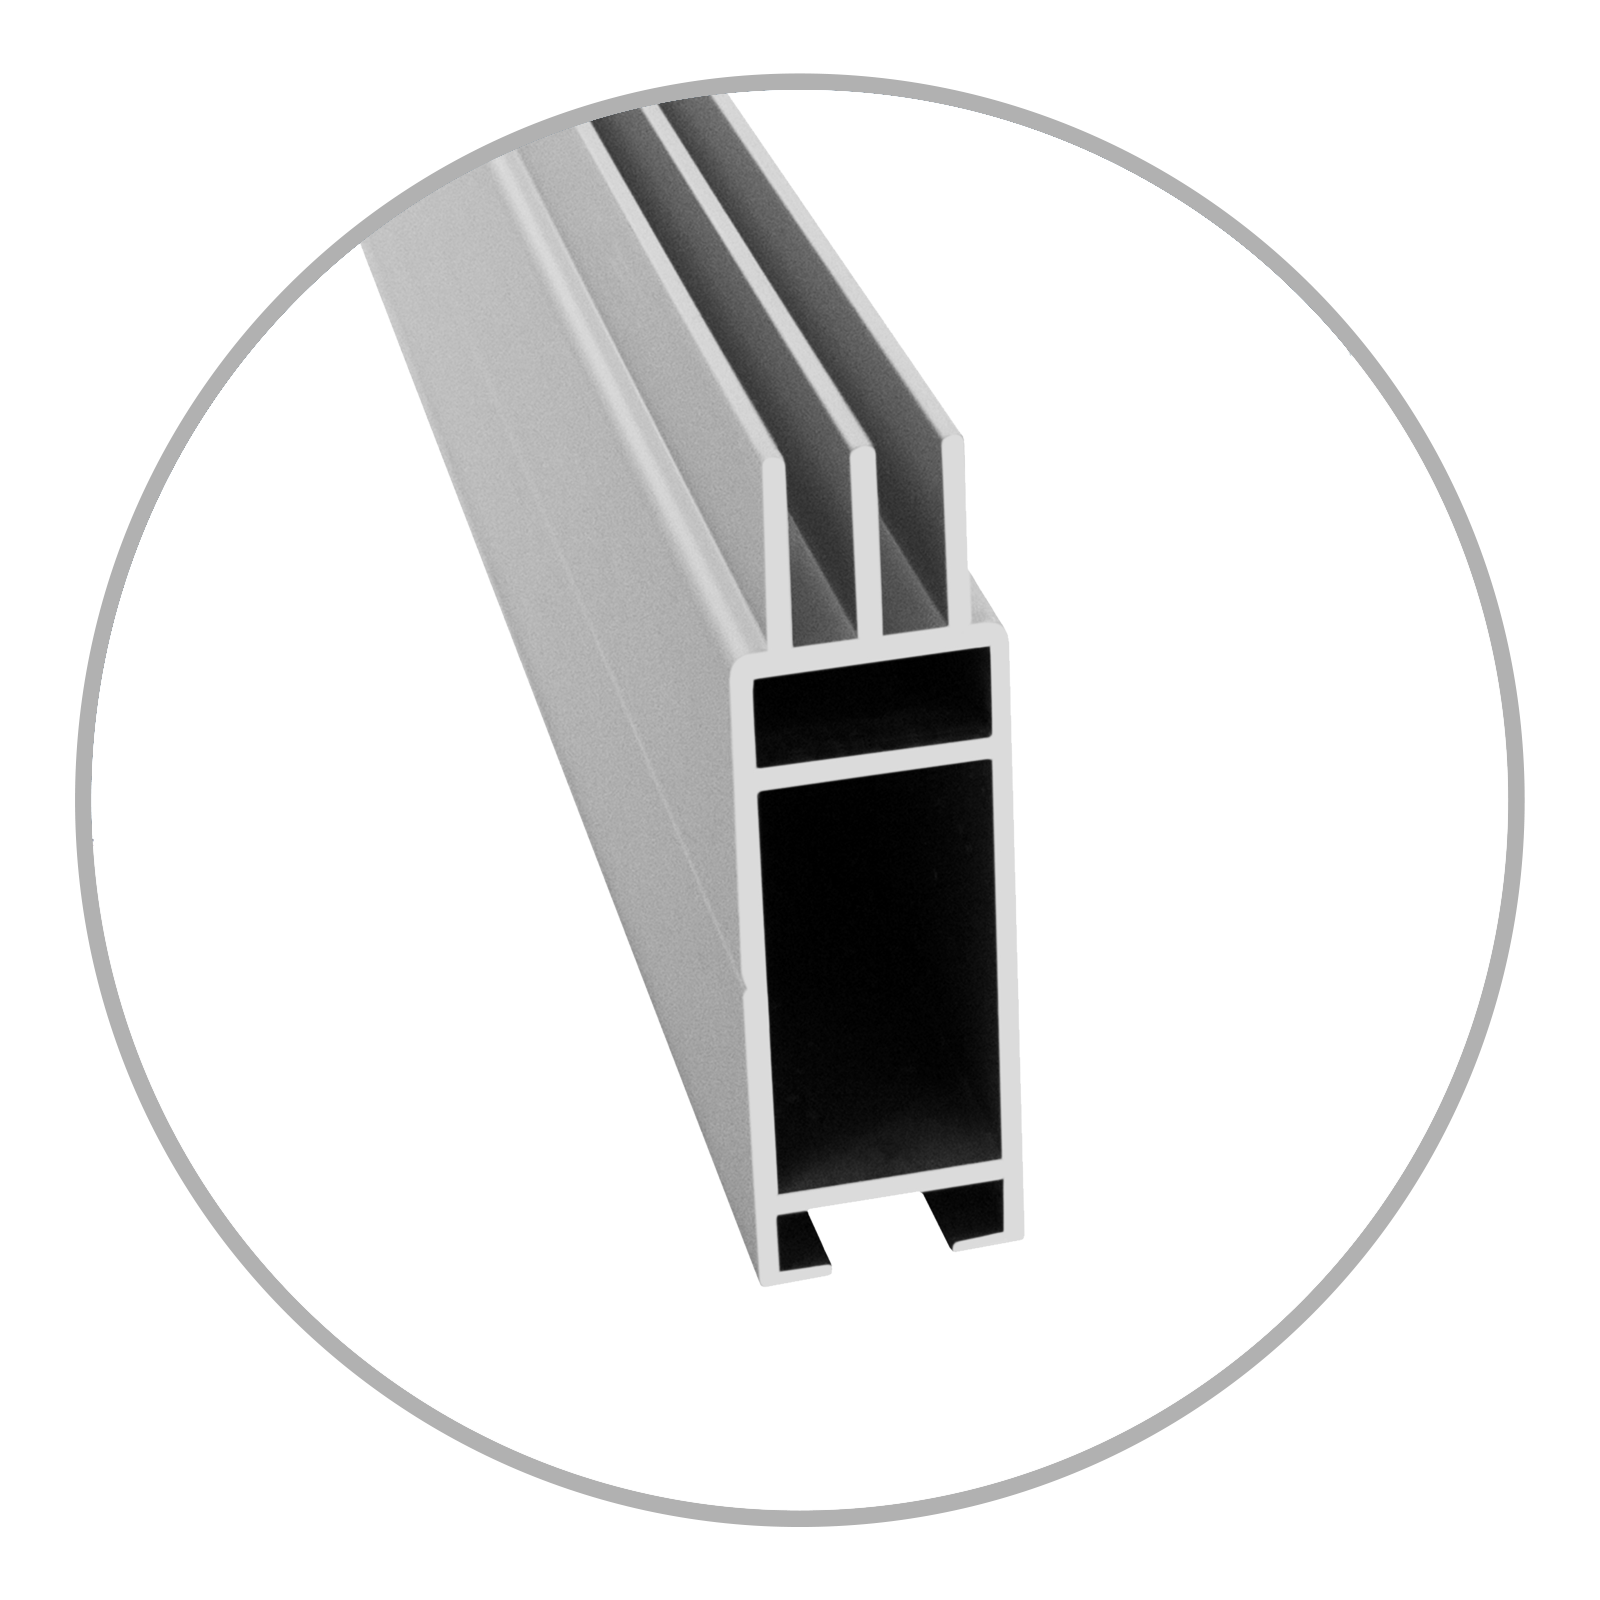 Easyframe Profil cube silber